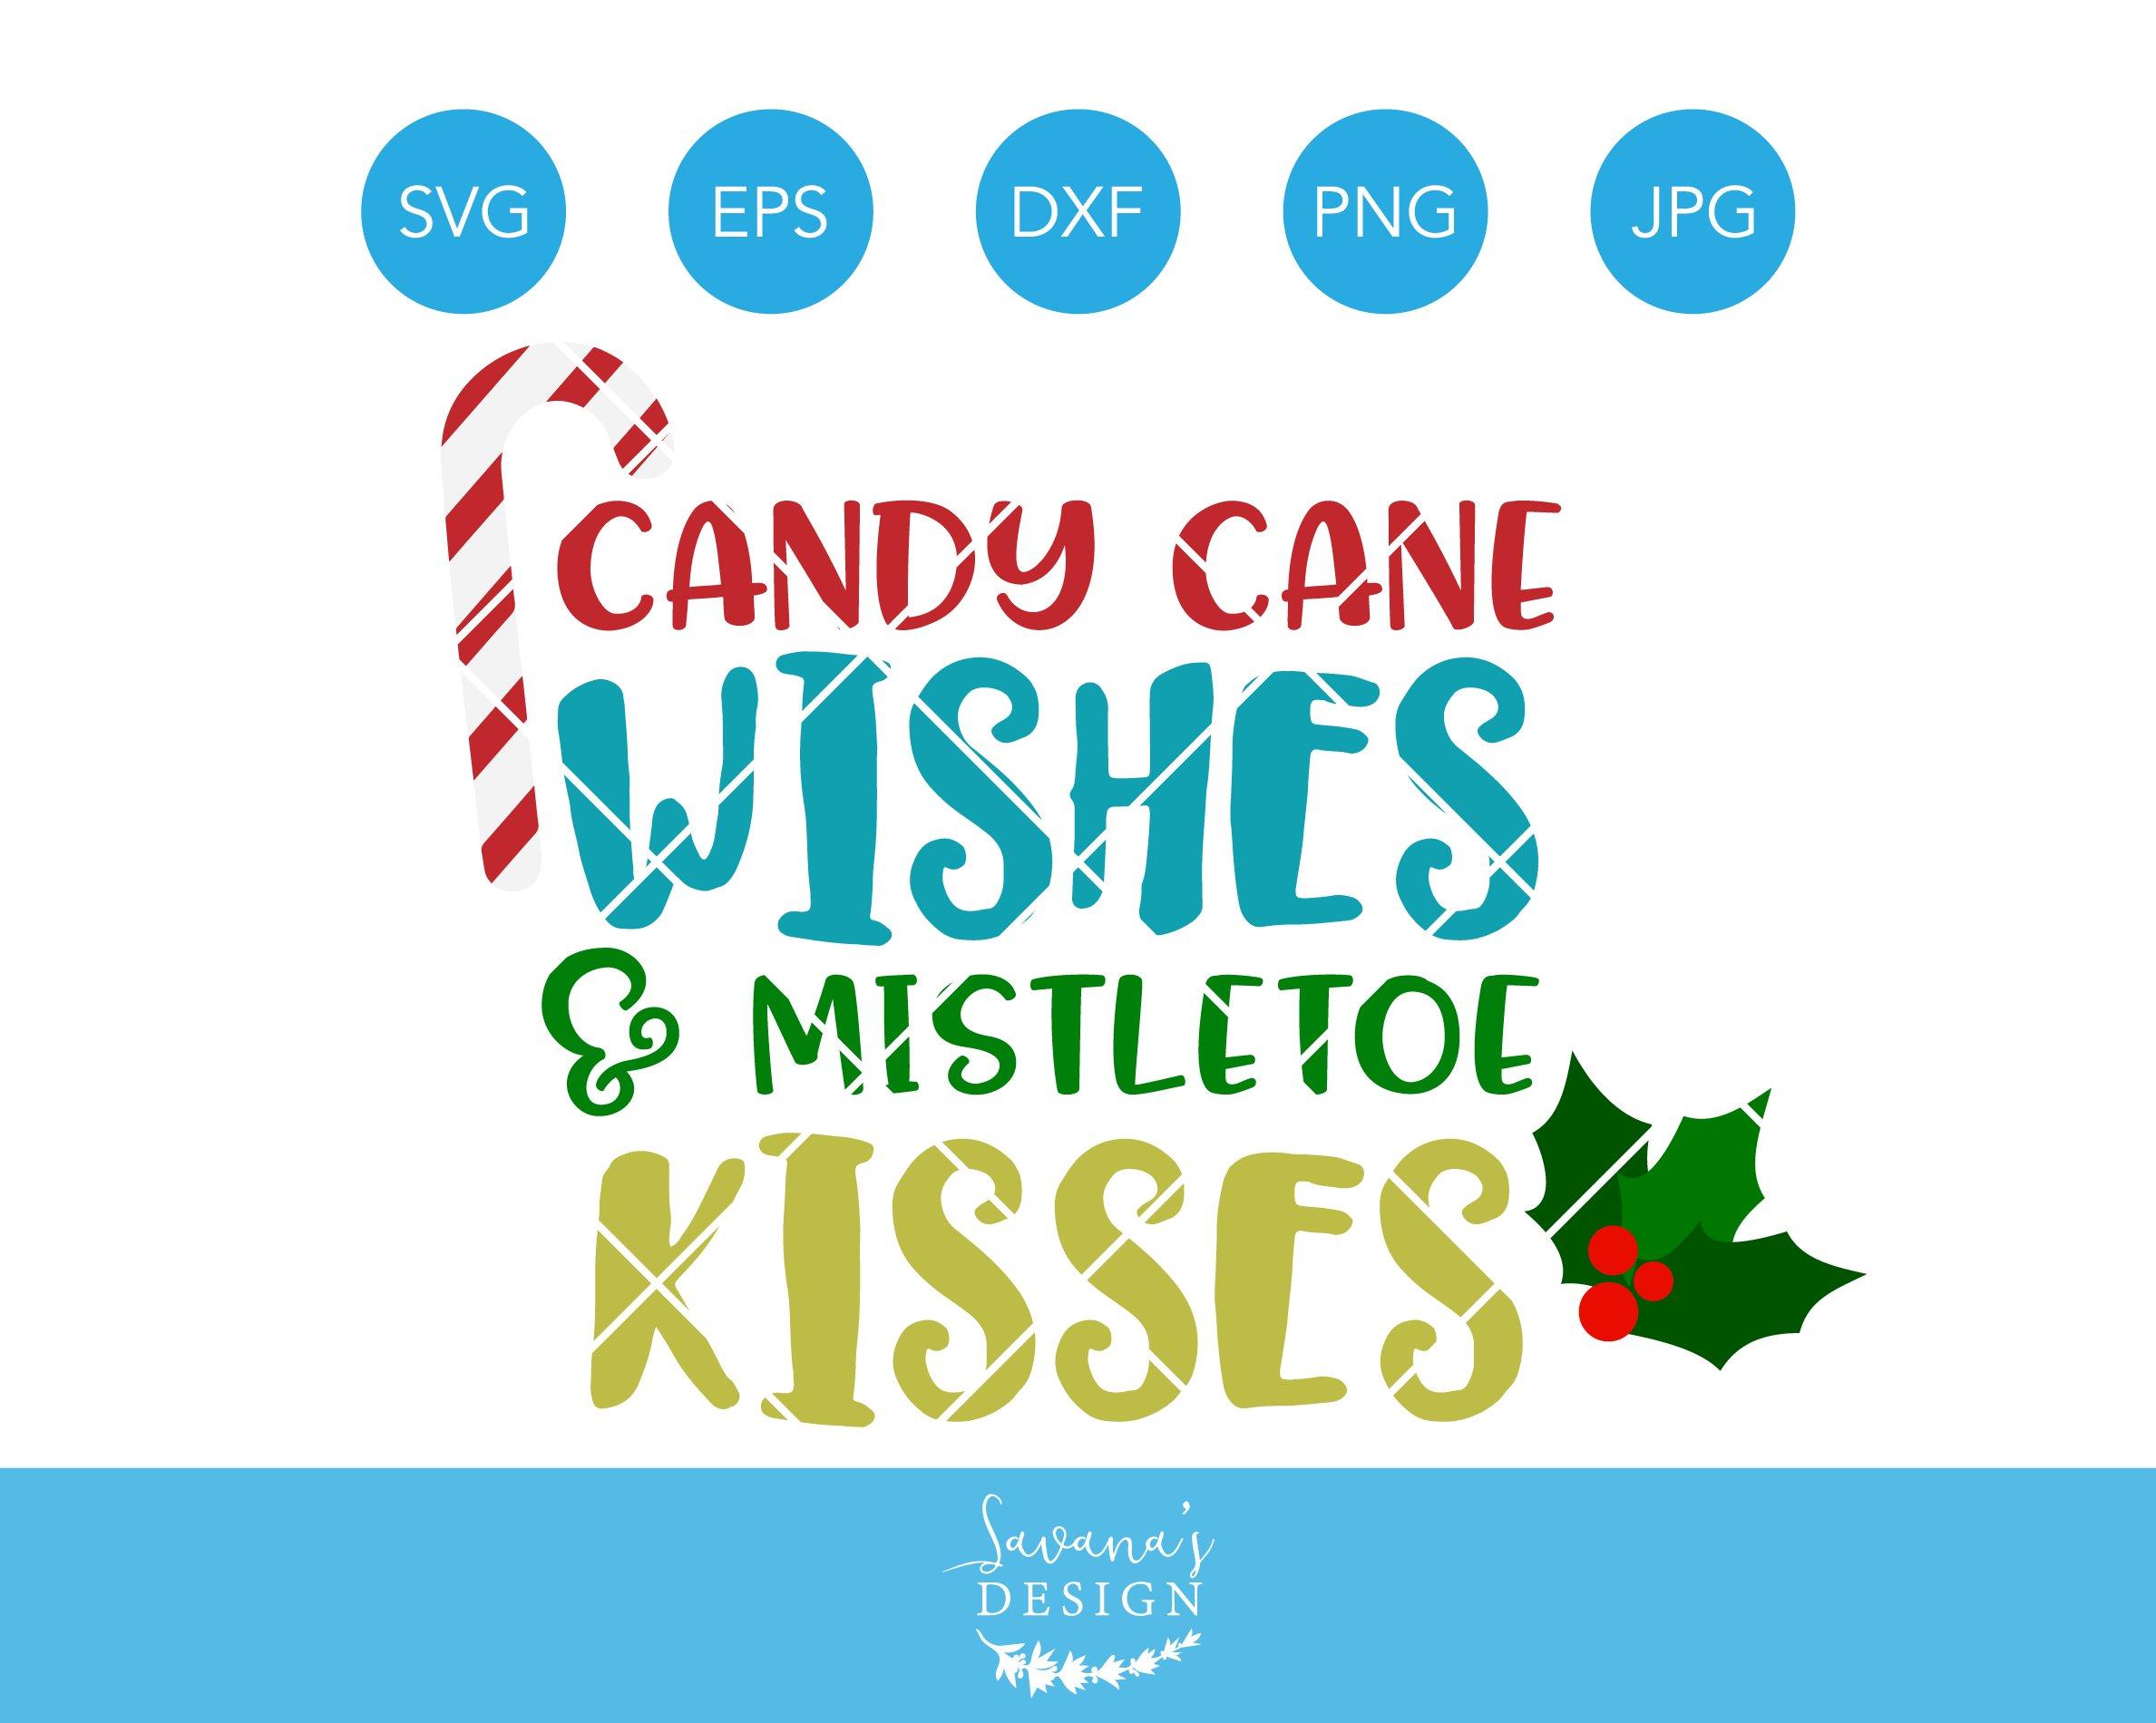 Candy cane wishes mistletoe kisses illustrations creative market buycottarizona Image collections